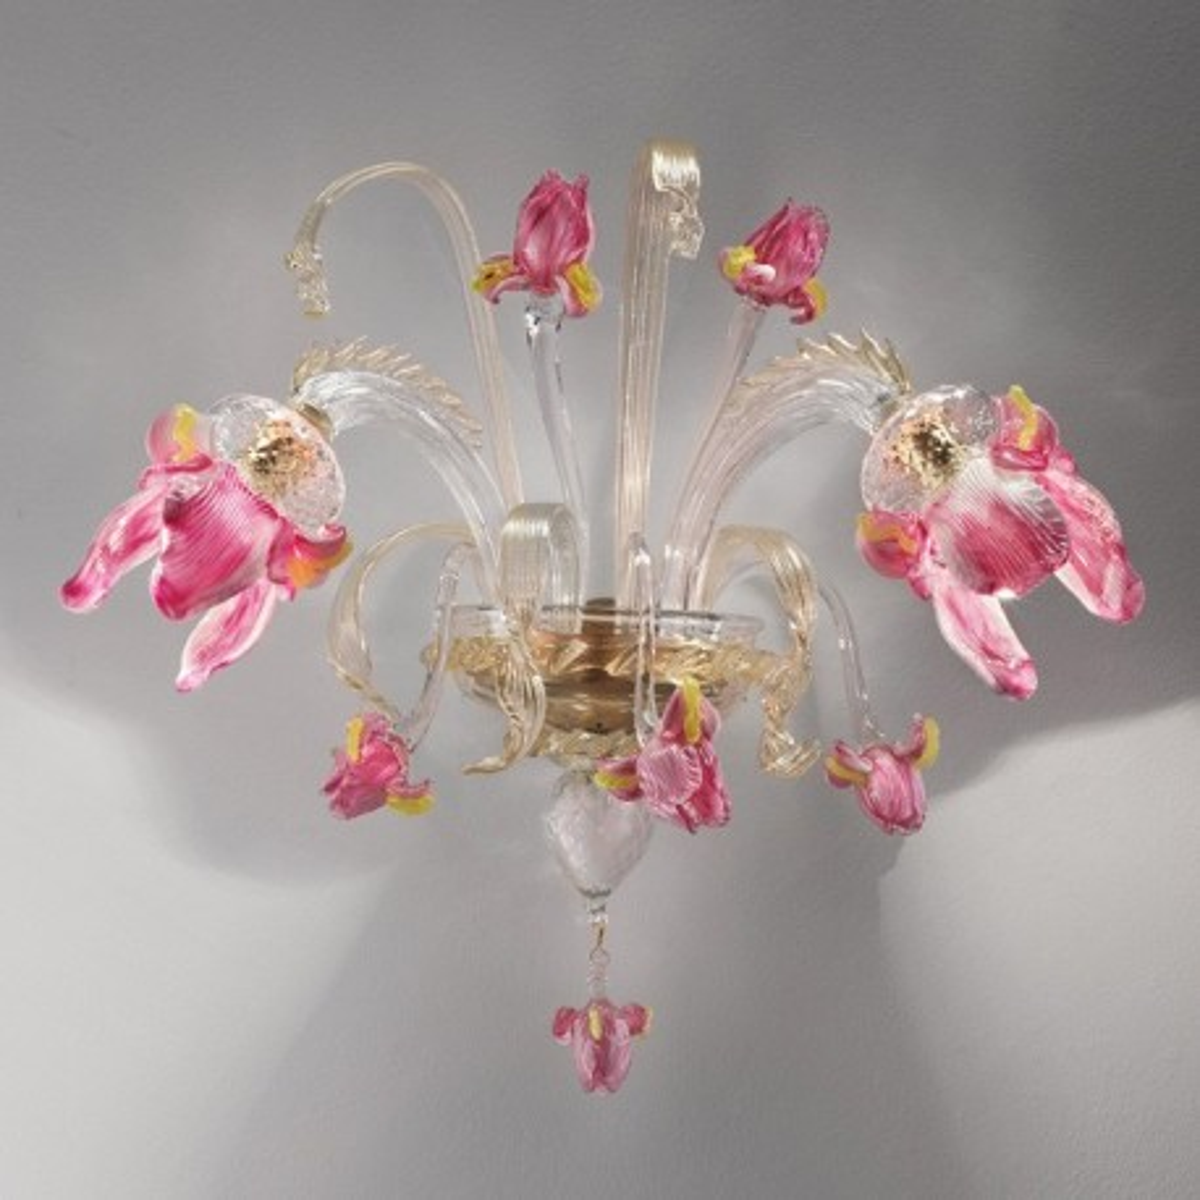 """Delizia"" 2 lumières applique en verre de Murano fleurs roses"